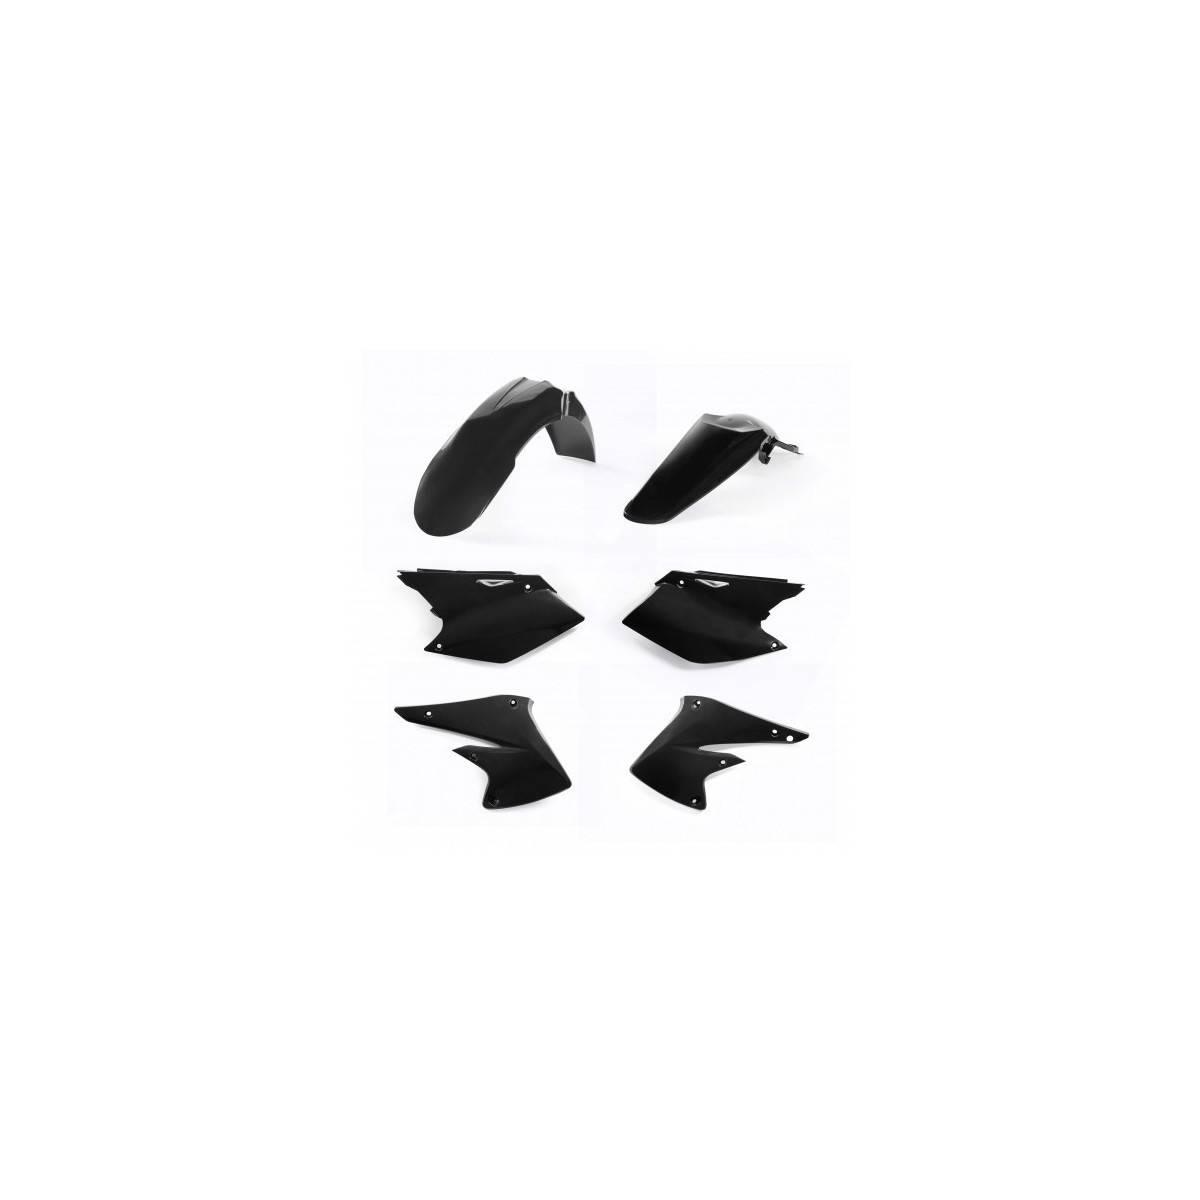 0023080-090 - Kit Plasticos Yzf 250 18 Negro